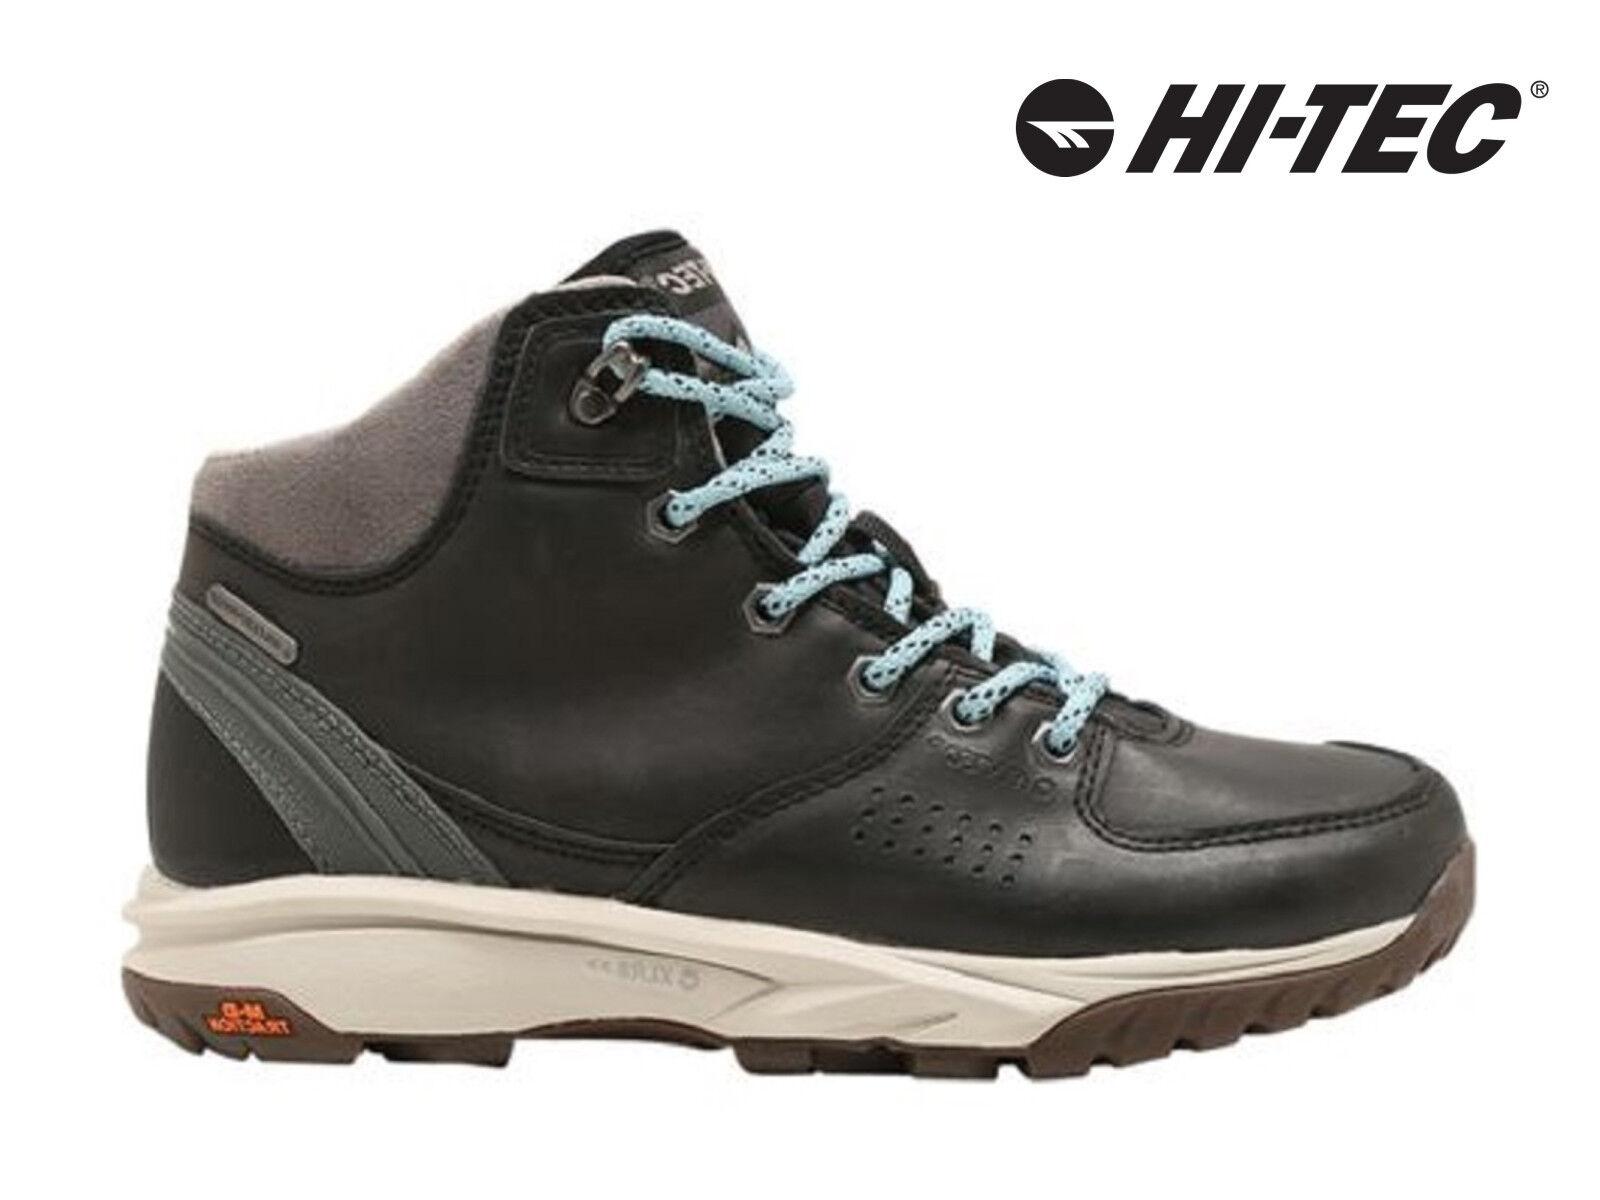 Womens Hi-Tec Wildlife Lux Waterproof Walking Hiking Boots Mid Trekking shoes